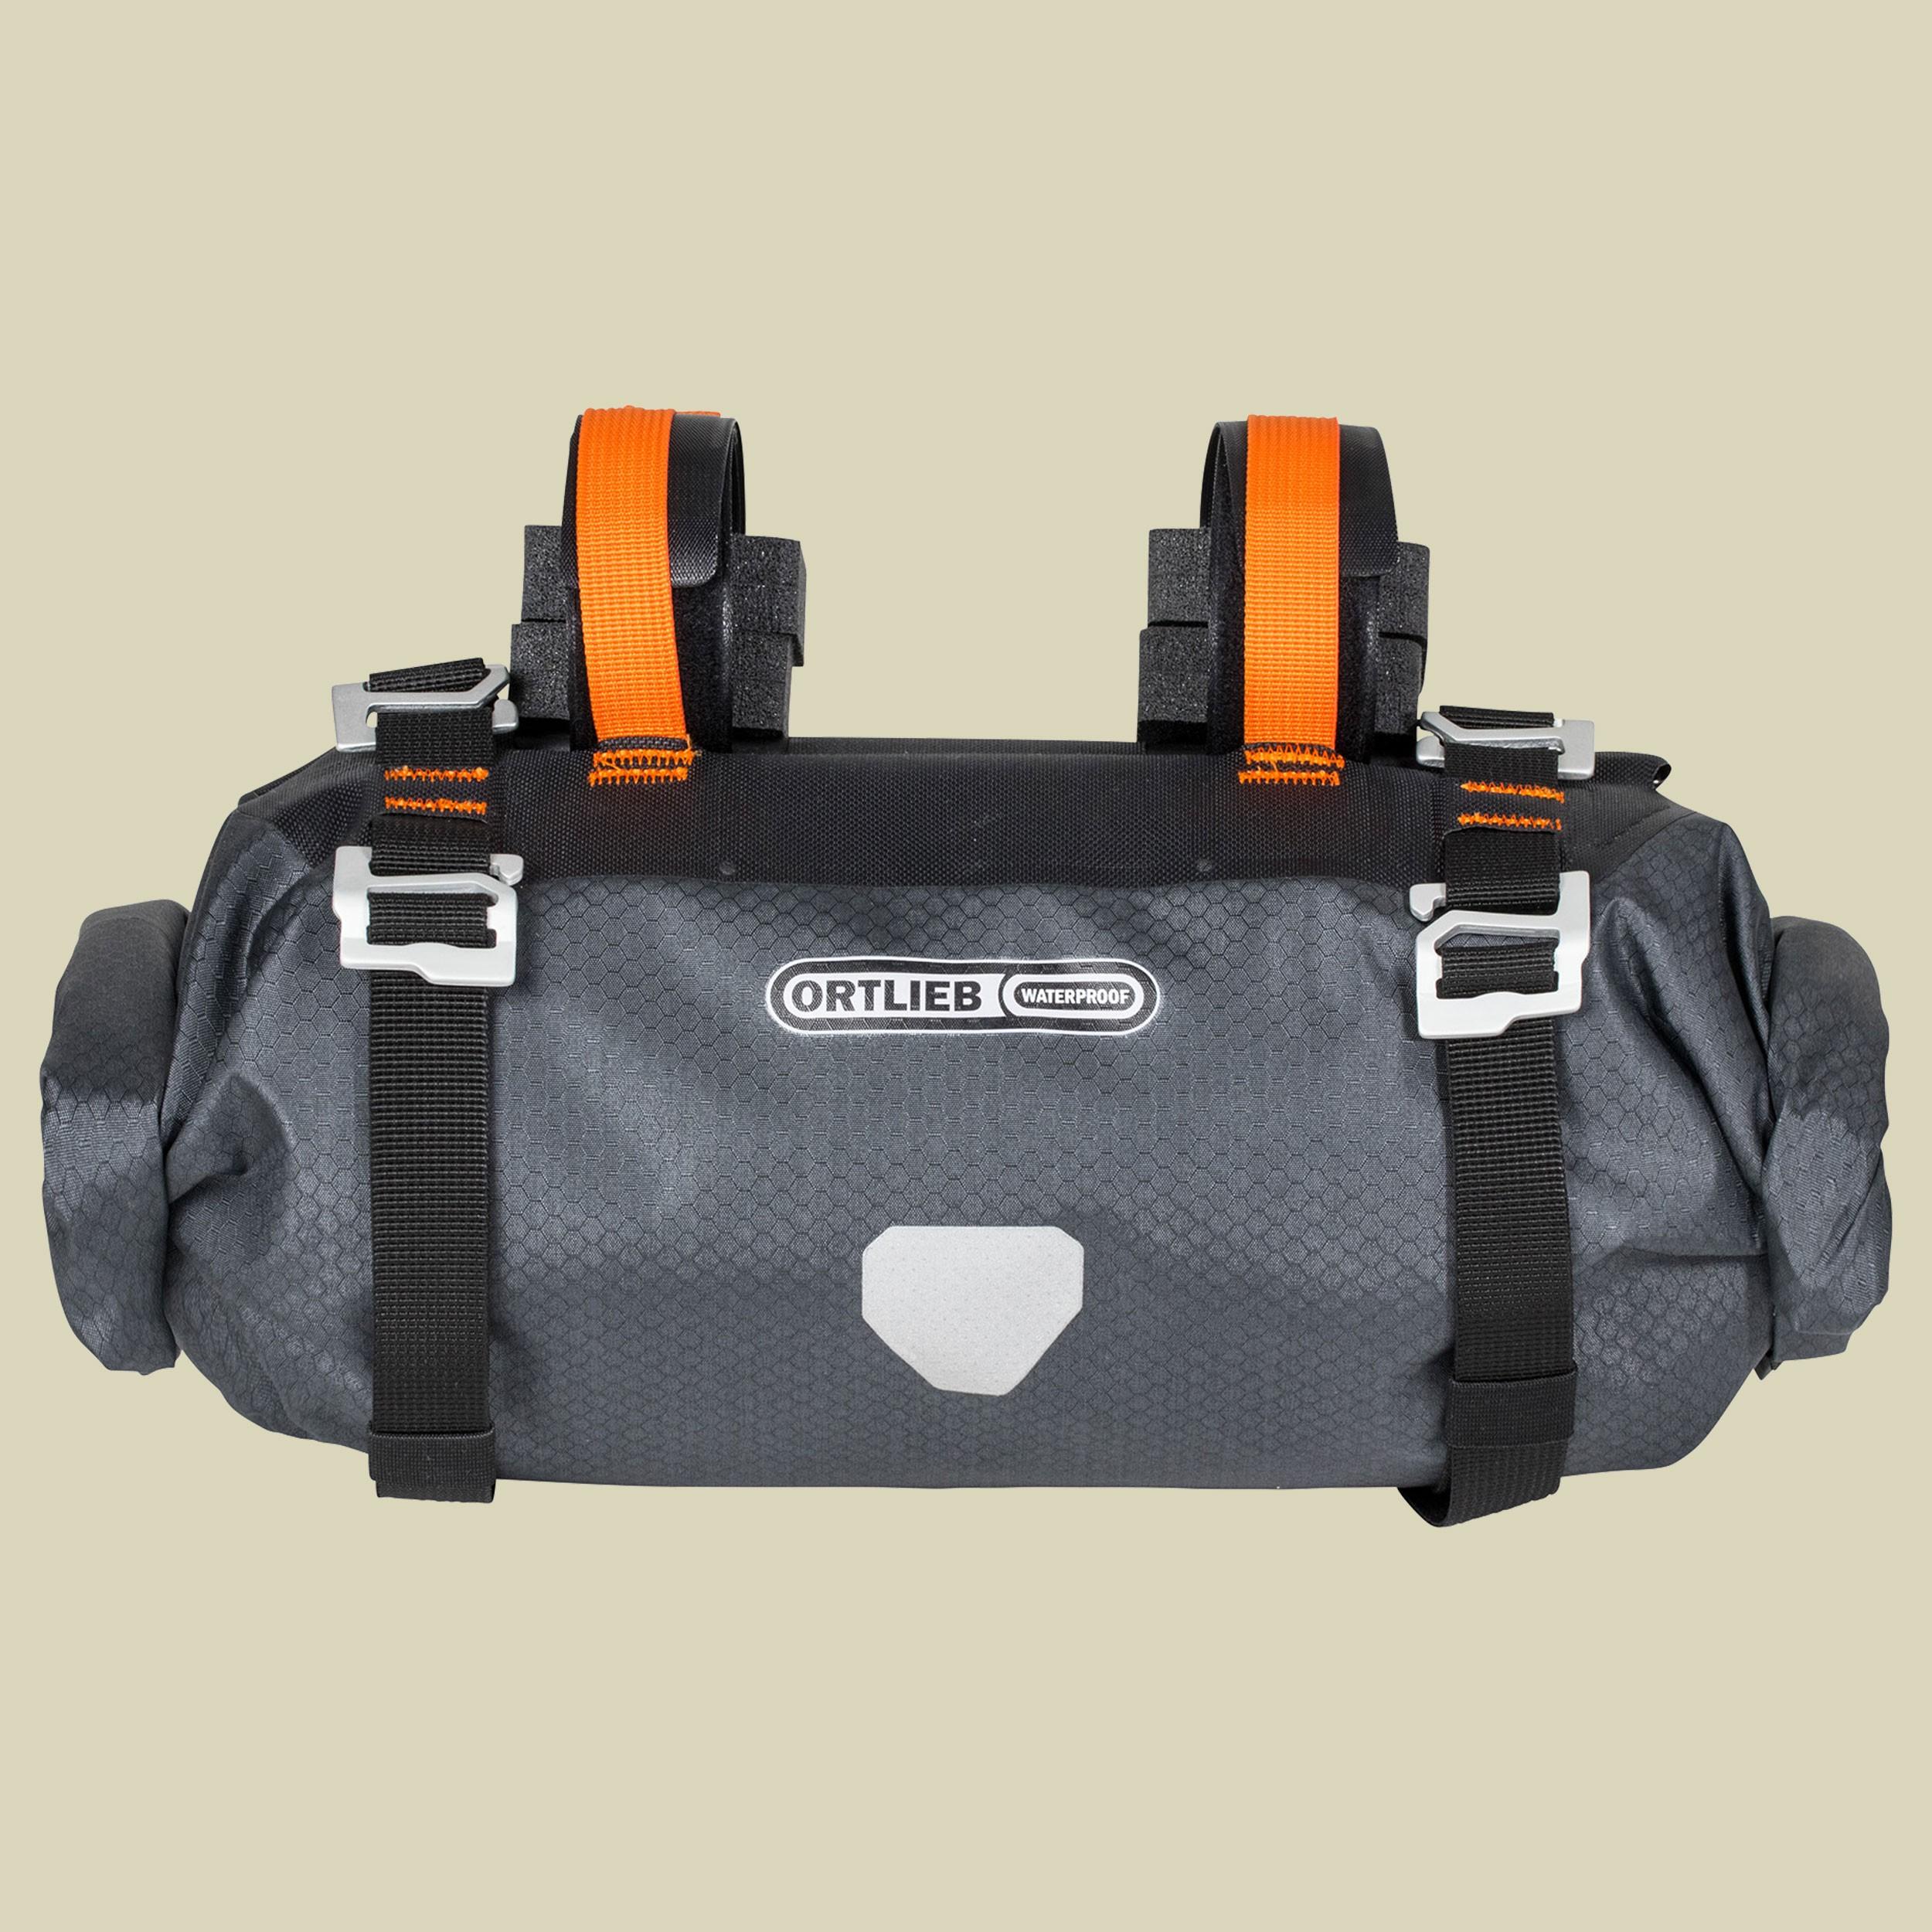 ortlieb_handlebarpack_s_f9931_front1_fallback